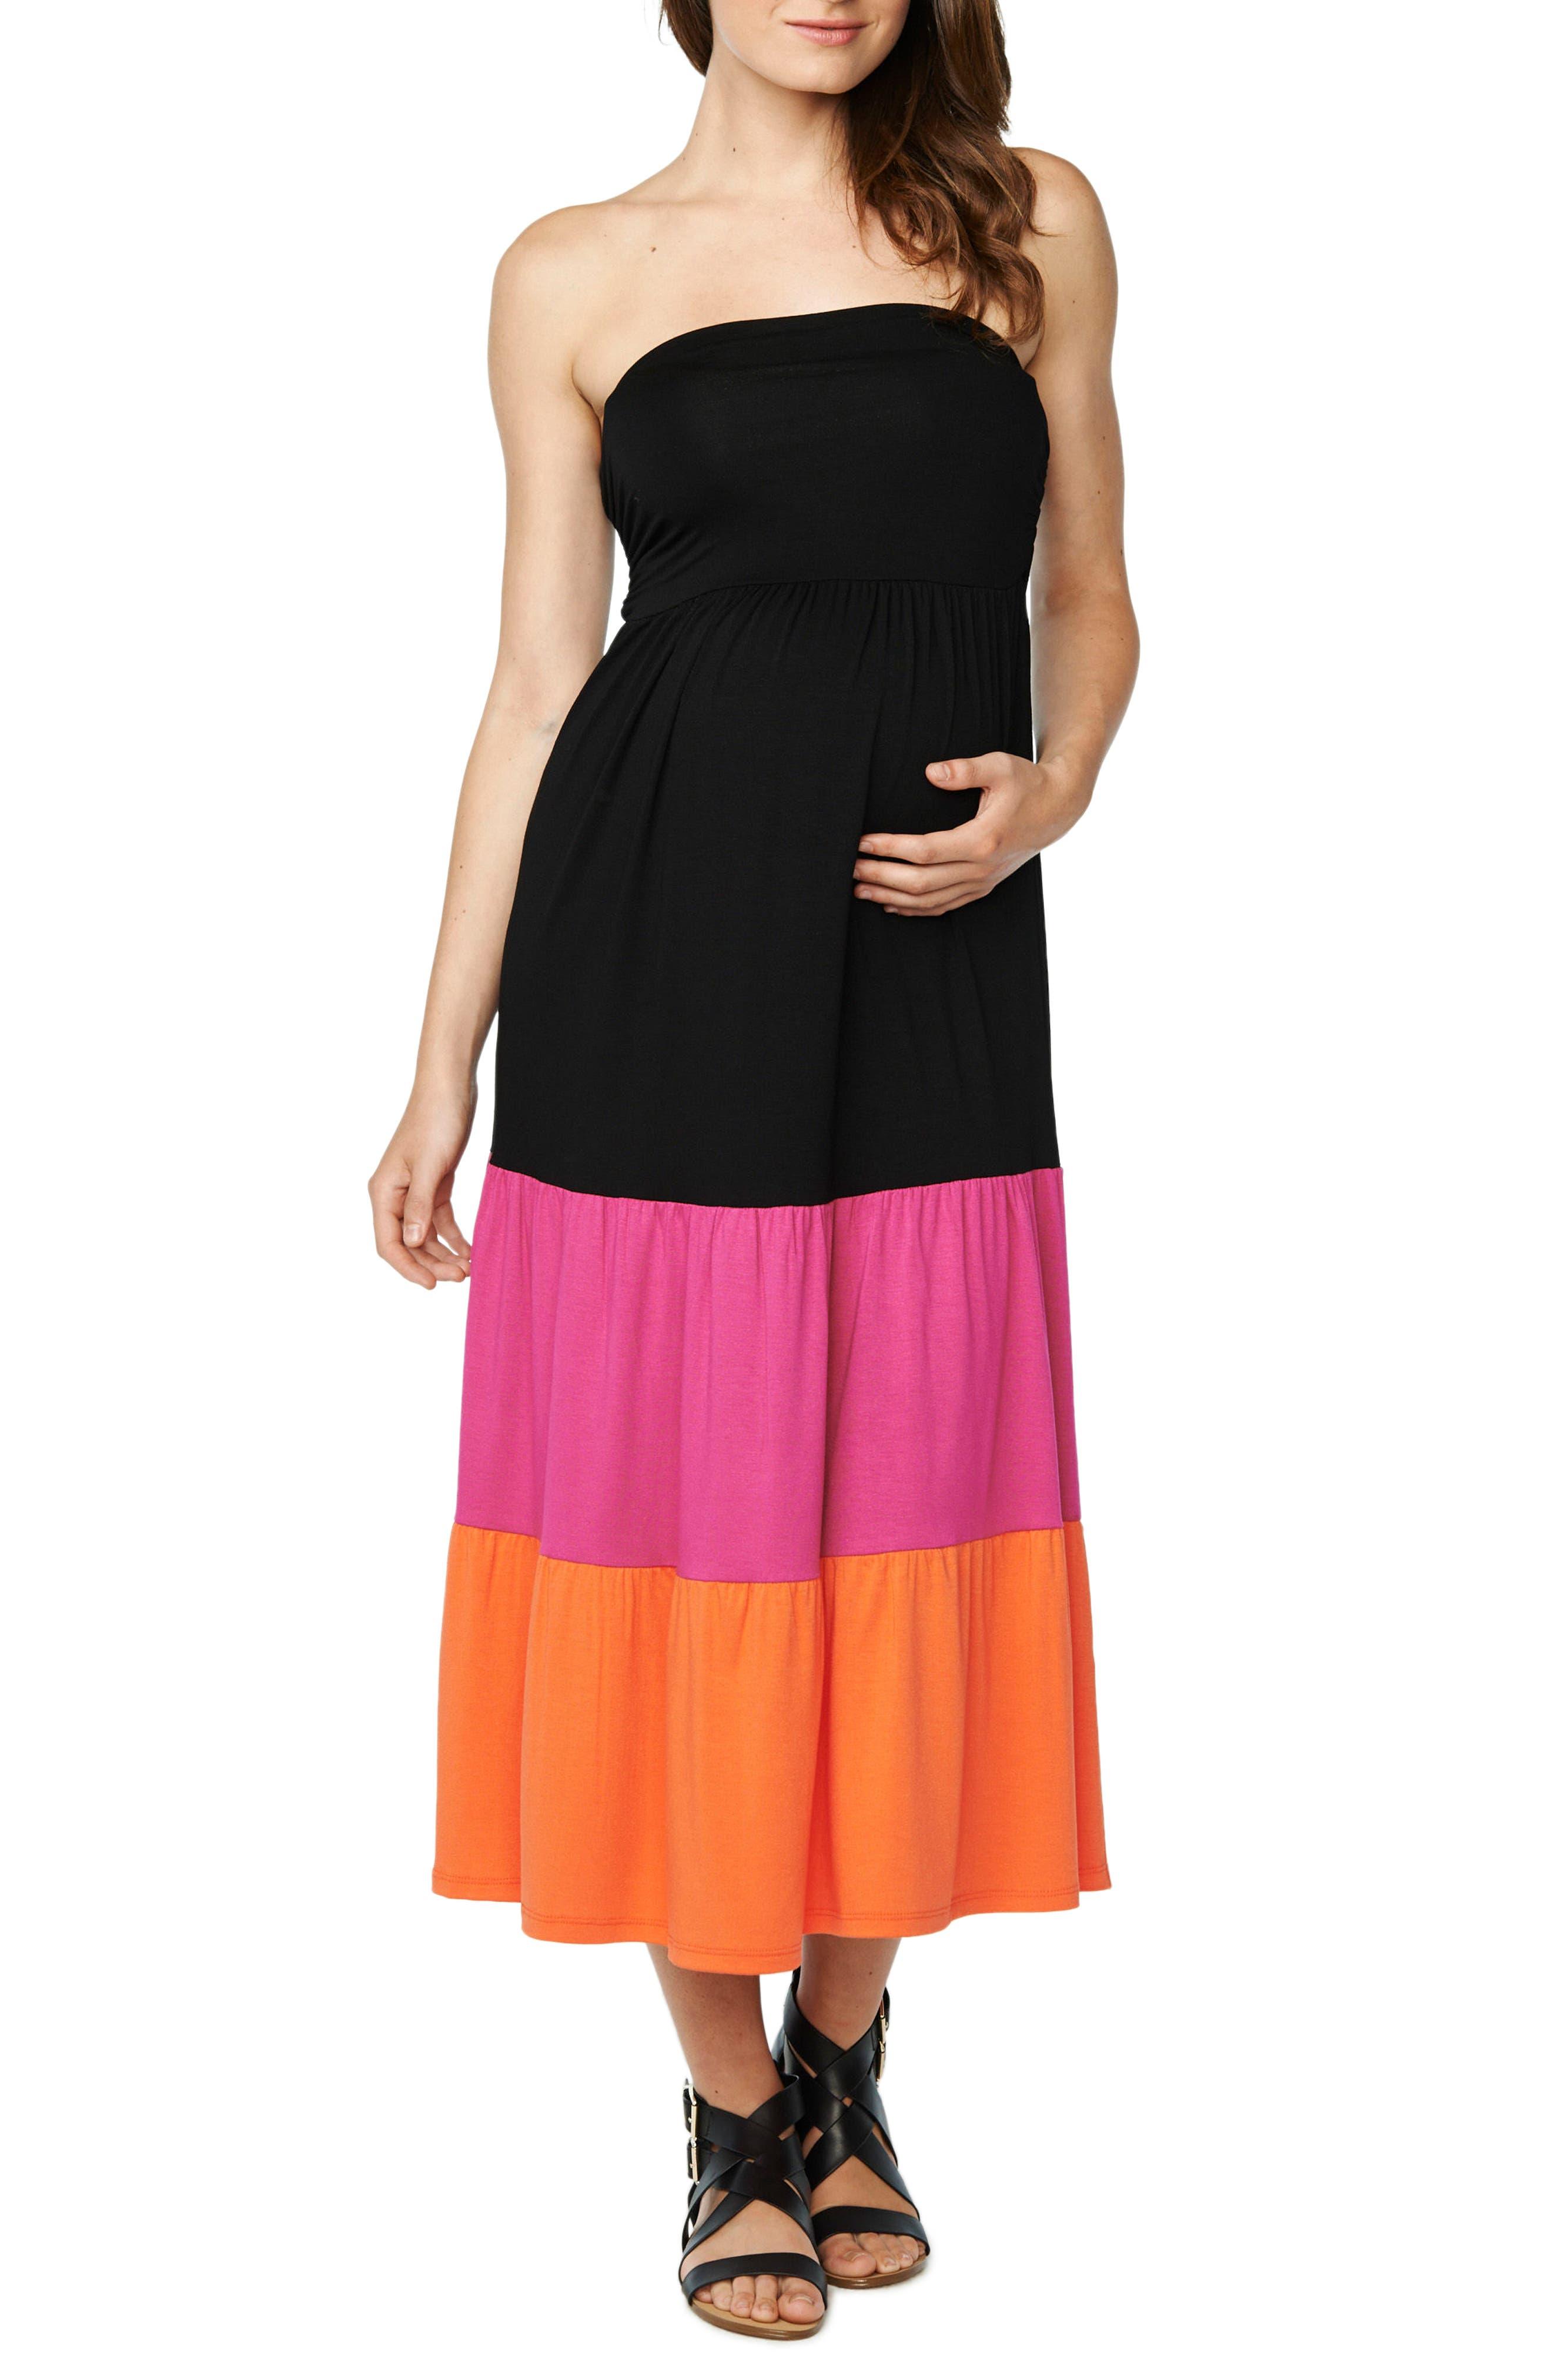 Convertible Strapless Maternity Dress,                             Main thumbnail 1, color,                             001